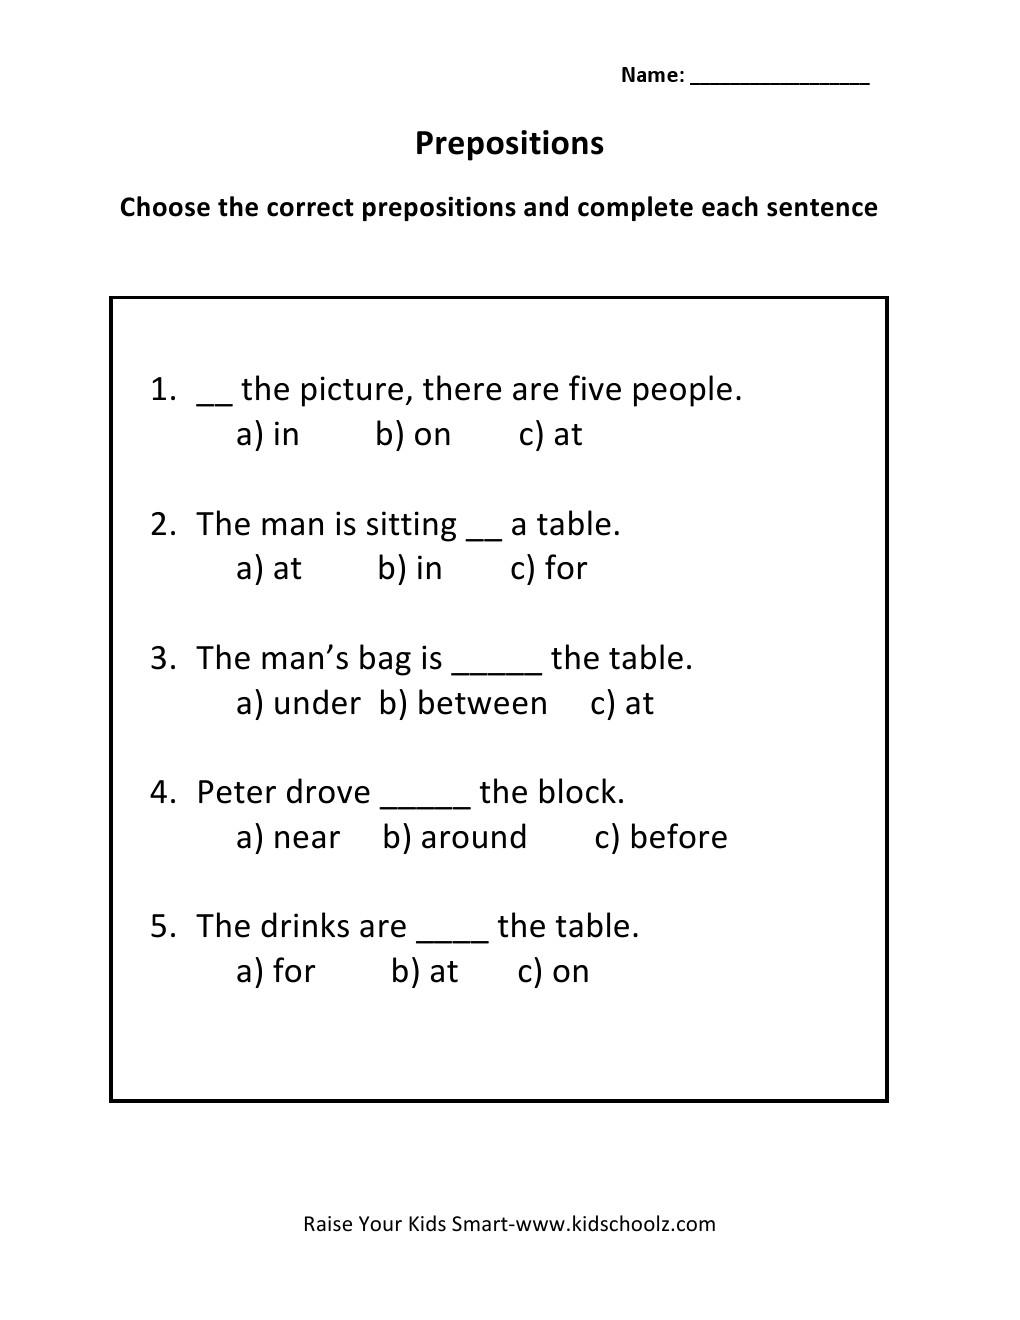 Prepositions Worksheets For Grade 2 Worksheets For All